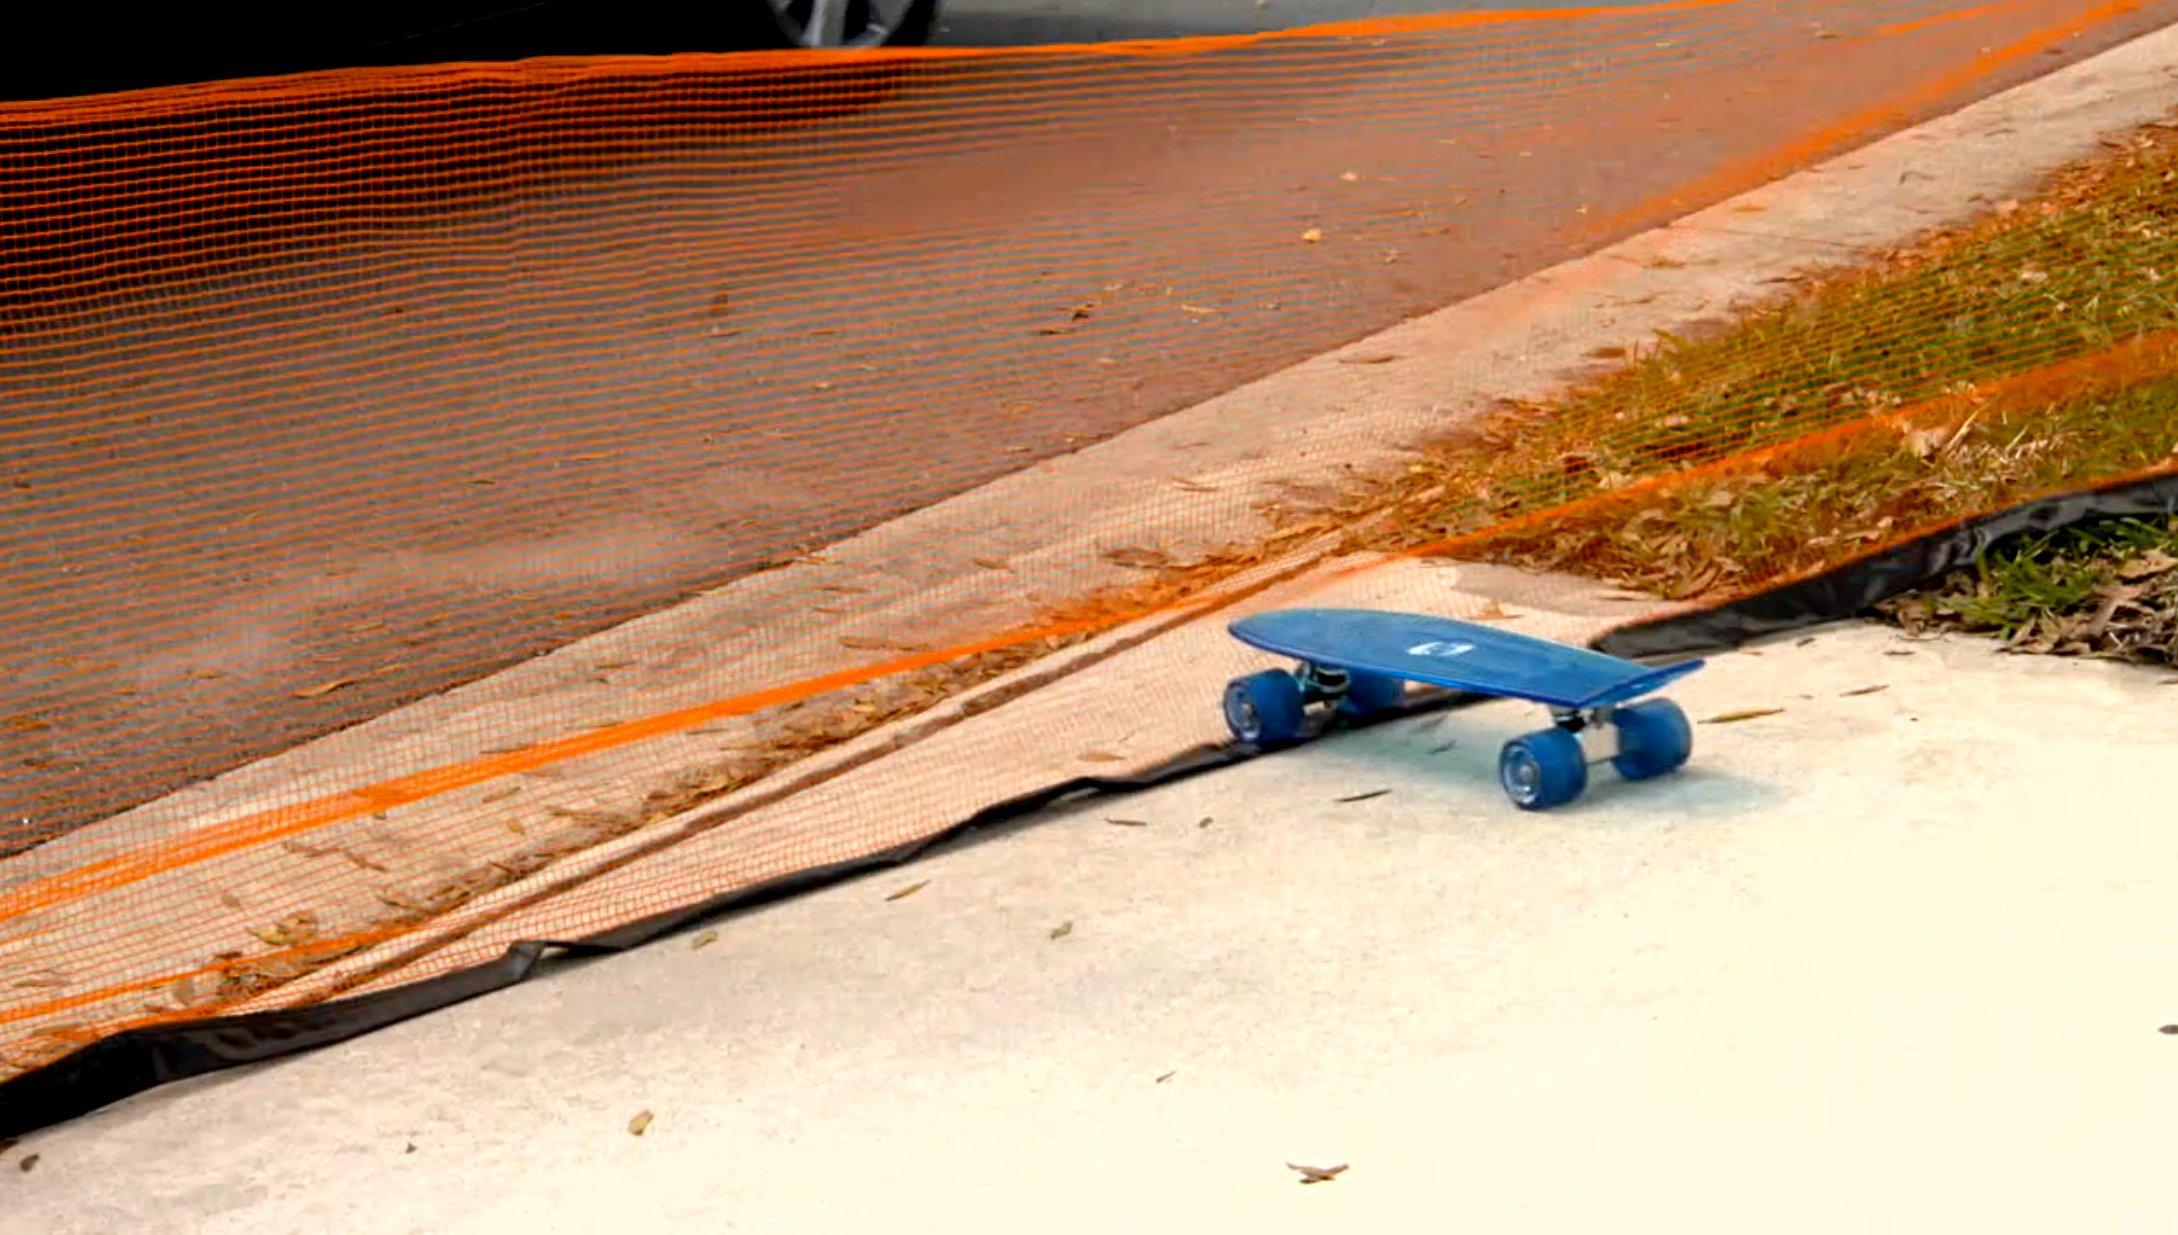 Play It Safe RPDN26 Driveway Net, Large, Orange by Play It Safe (Image #4)